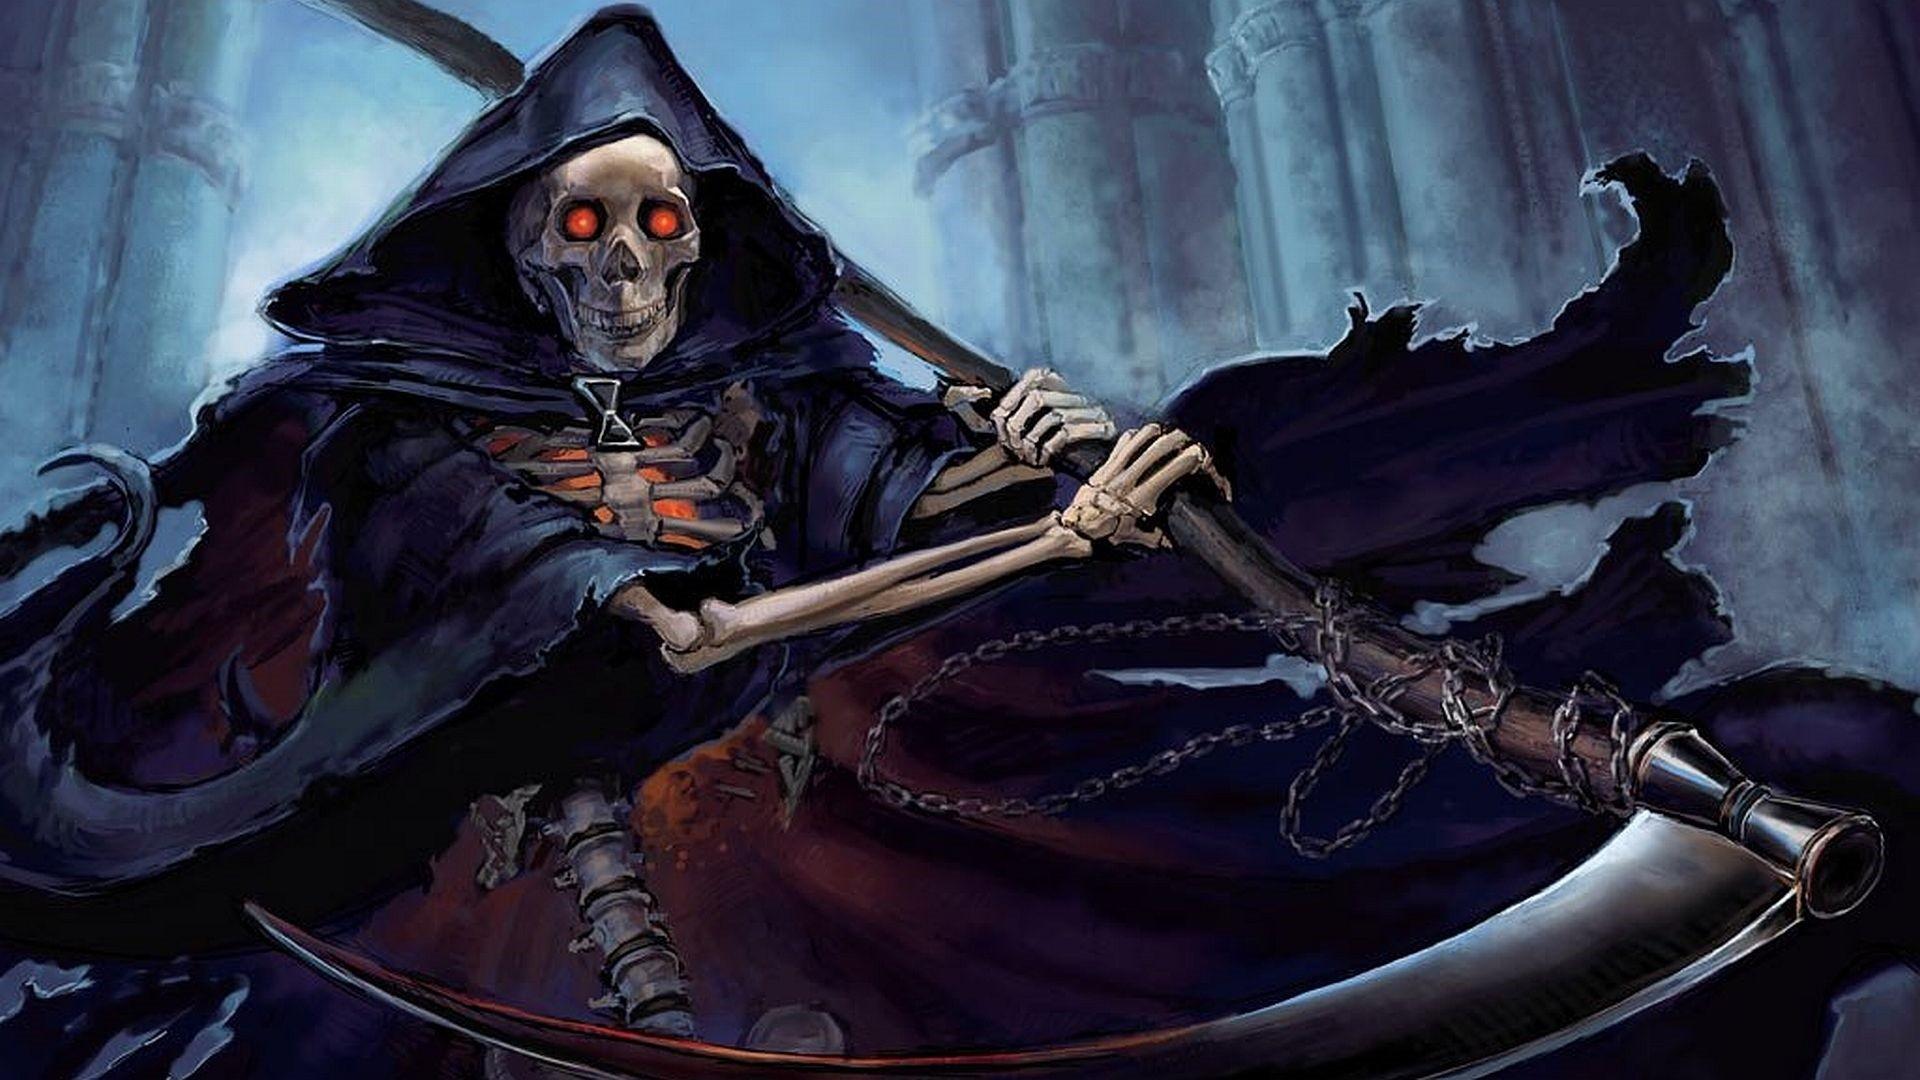 Grim Reaper Wallpaper for pc